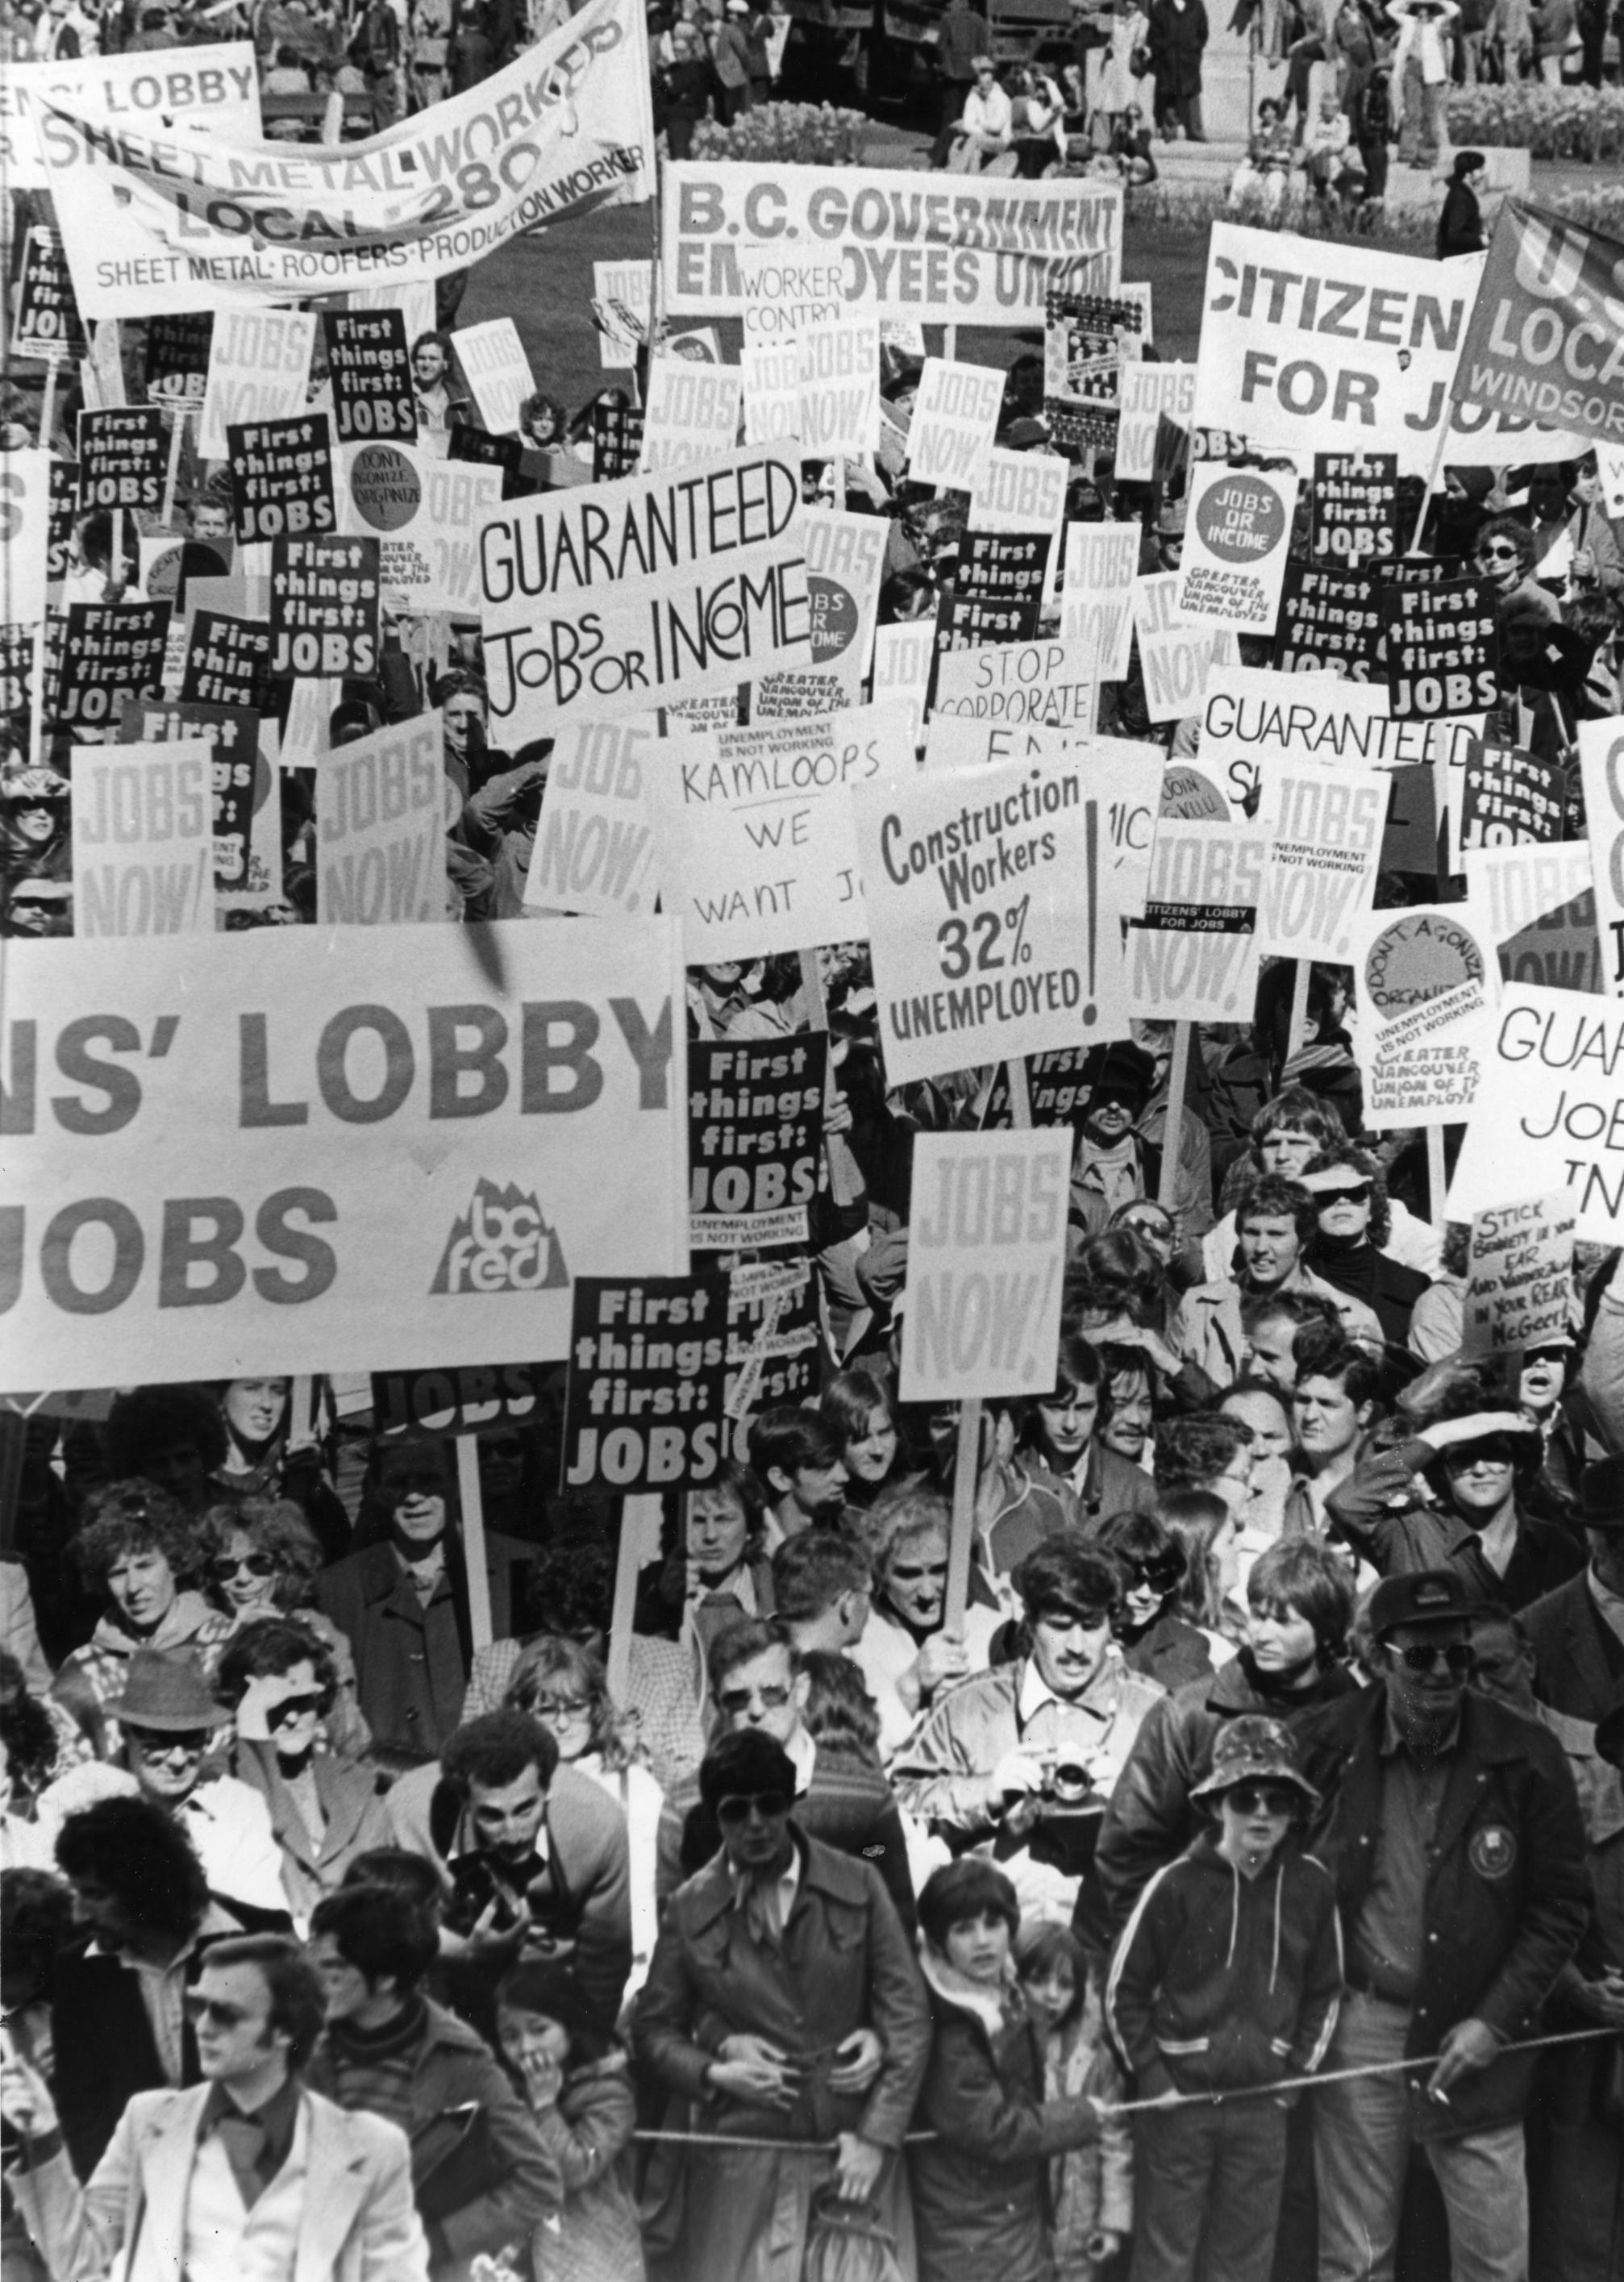 TR-LAB 30378 Citizens Lobby Jobs 2